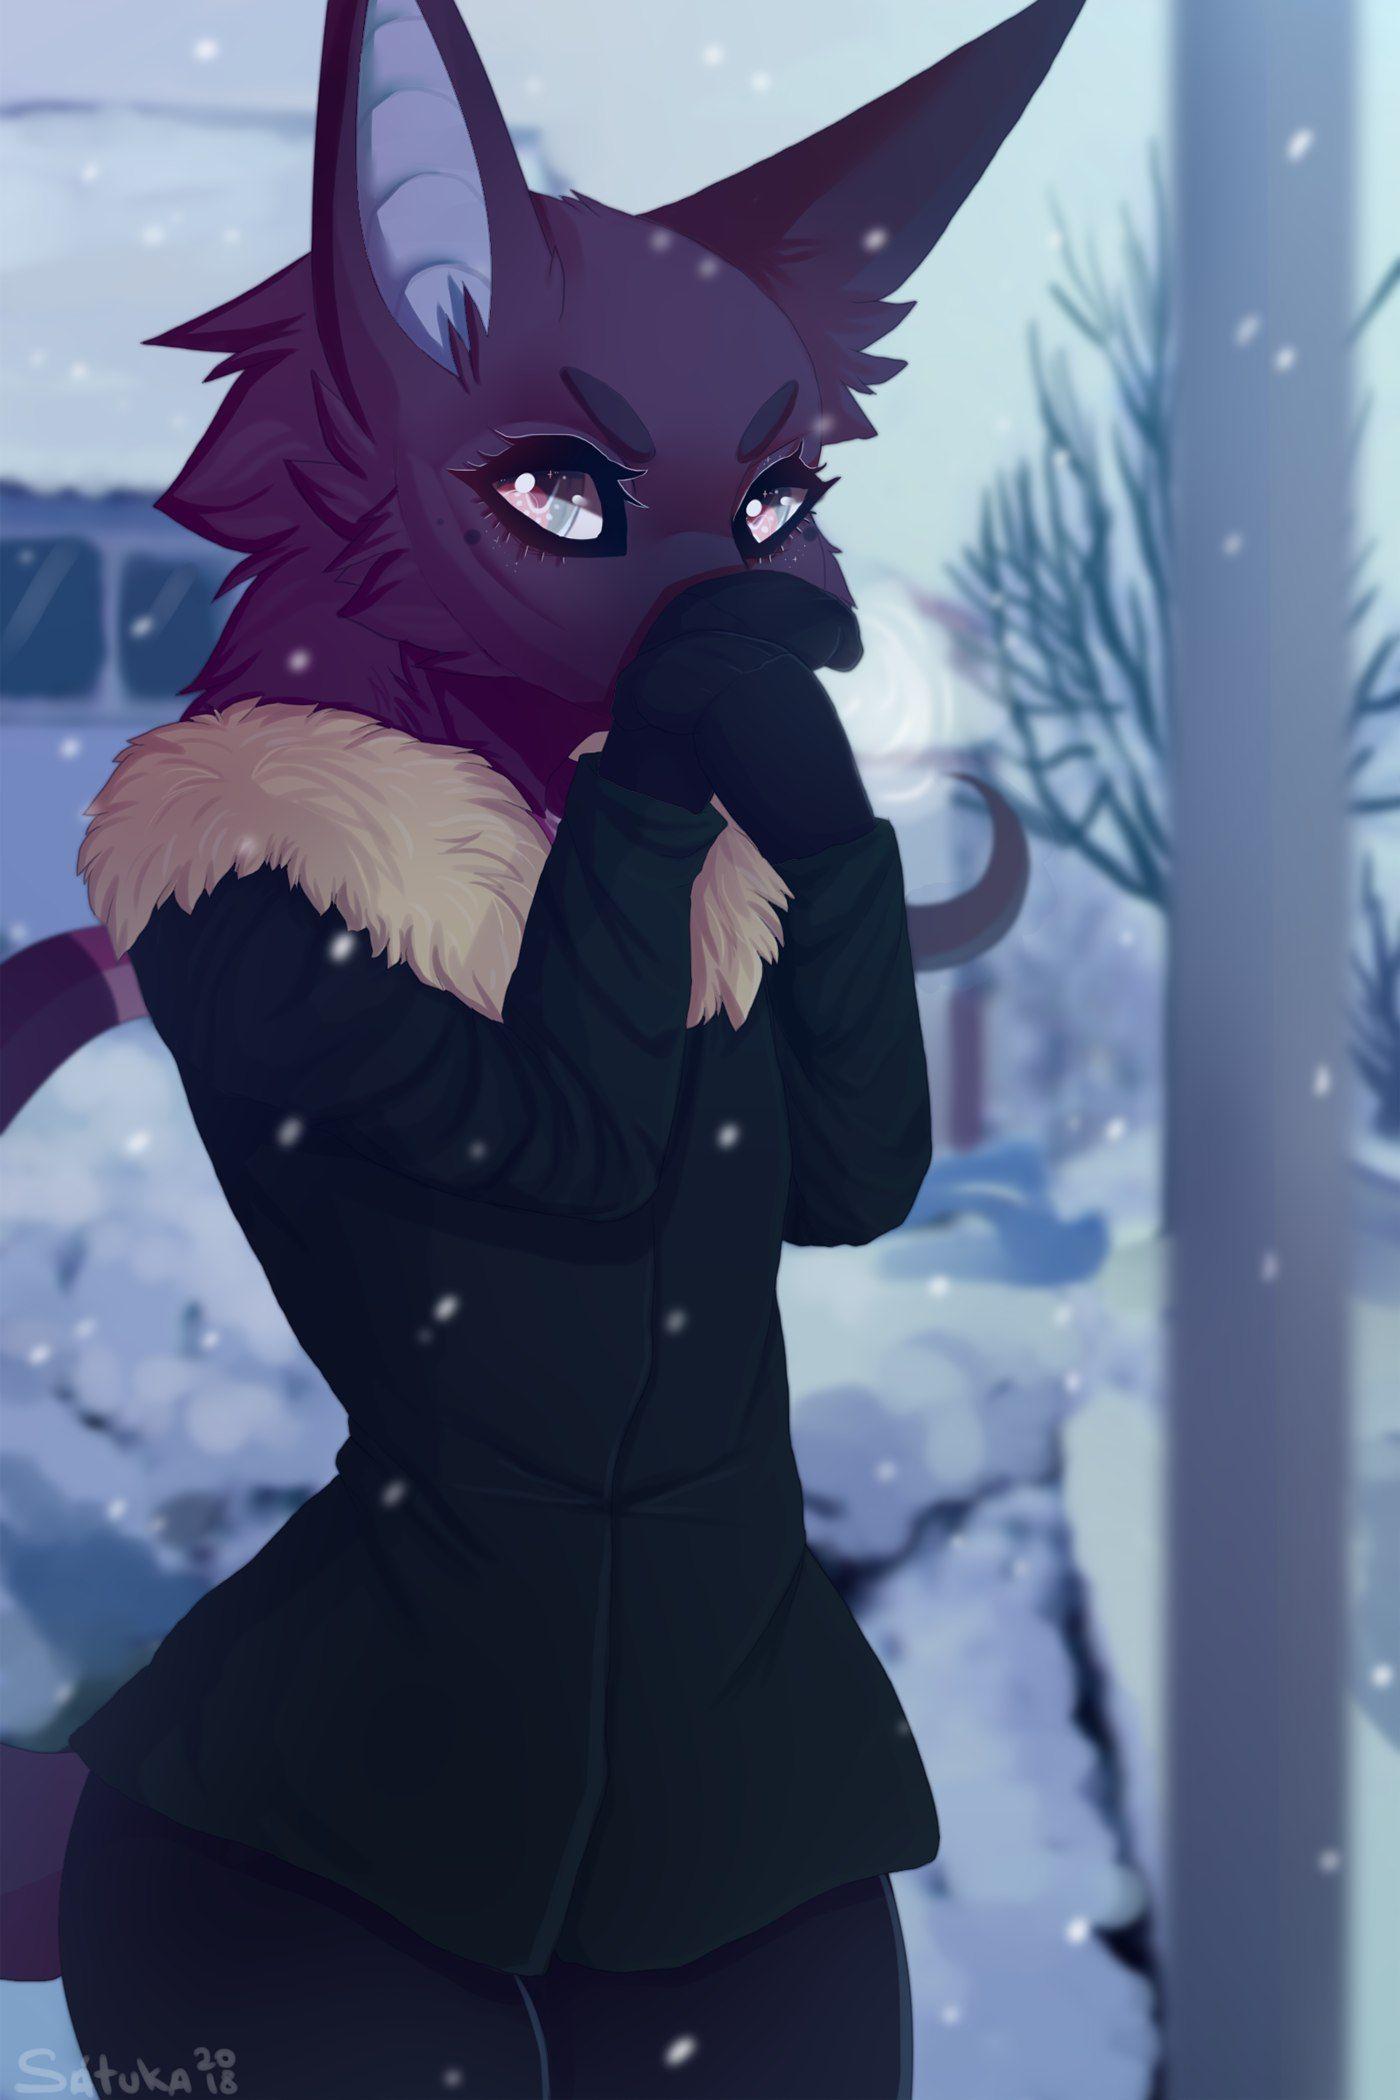 Furry art, Anthro